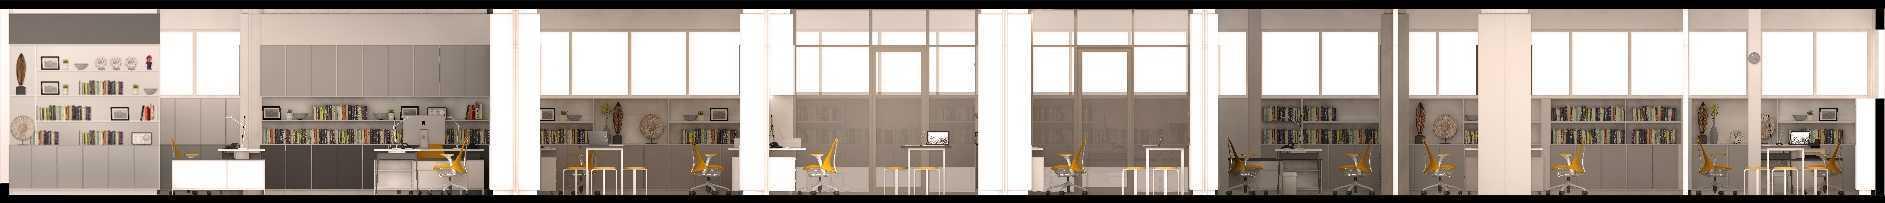 Studio Slenpan Interior Kantor Dekanat Fib Ui Gedung Ii Fib Ui, Jalan Prof. Dr. Selo Soemardjan Kampus Universitas Indonesia Depok 16424, Kota Depok, Jawa Barat 16424 Gedung Ii Fib Ui, Jalan Prof. Dr. Selo Soemardjan Kampus Universitas Indonesia Depok 16424, Kota Depok, Jawa Barat 16424 2017-11-23-Office-Fib-Re-Render-Ida-Potongan-1-Copy   47416